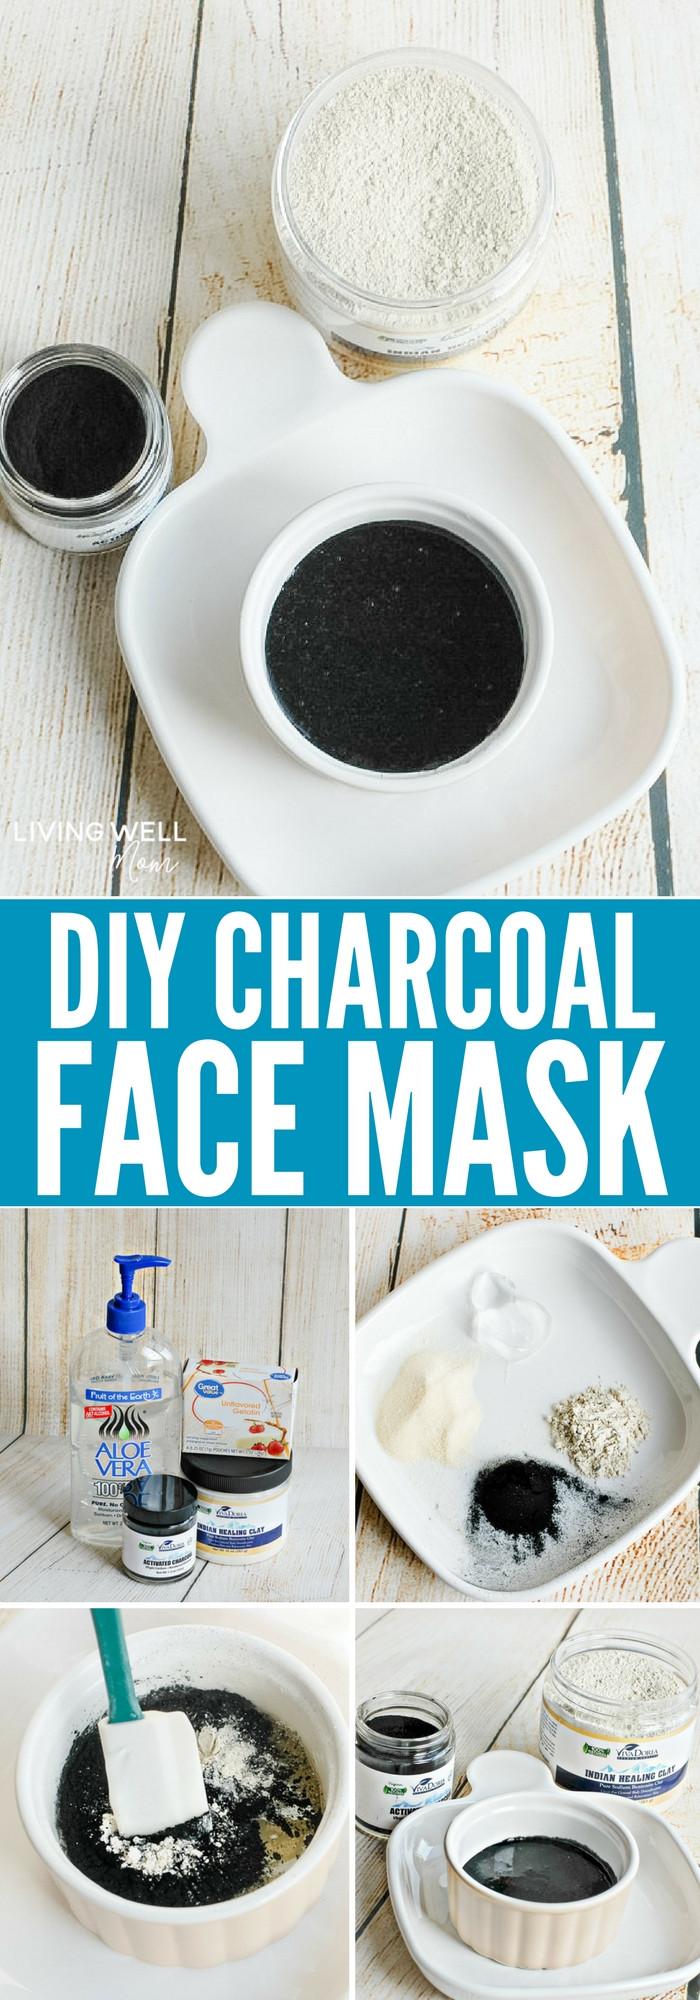 DIY Charcoal Face Mask  DIY Charcoal Face Mask Recipe Living Well Mom